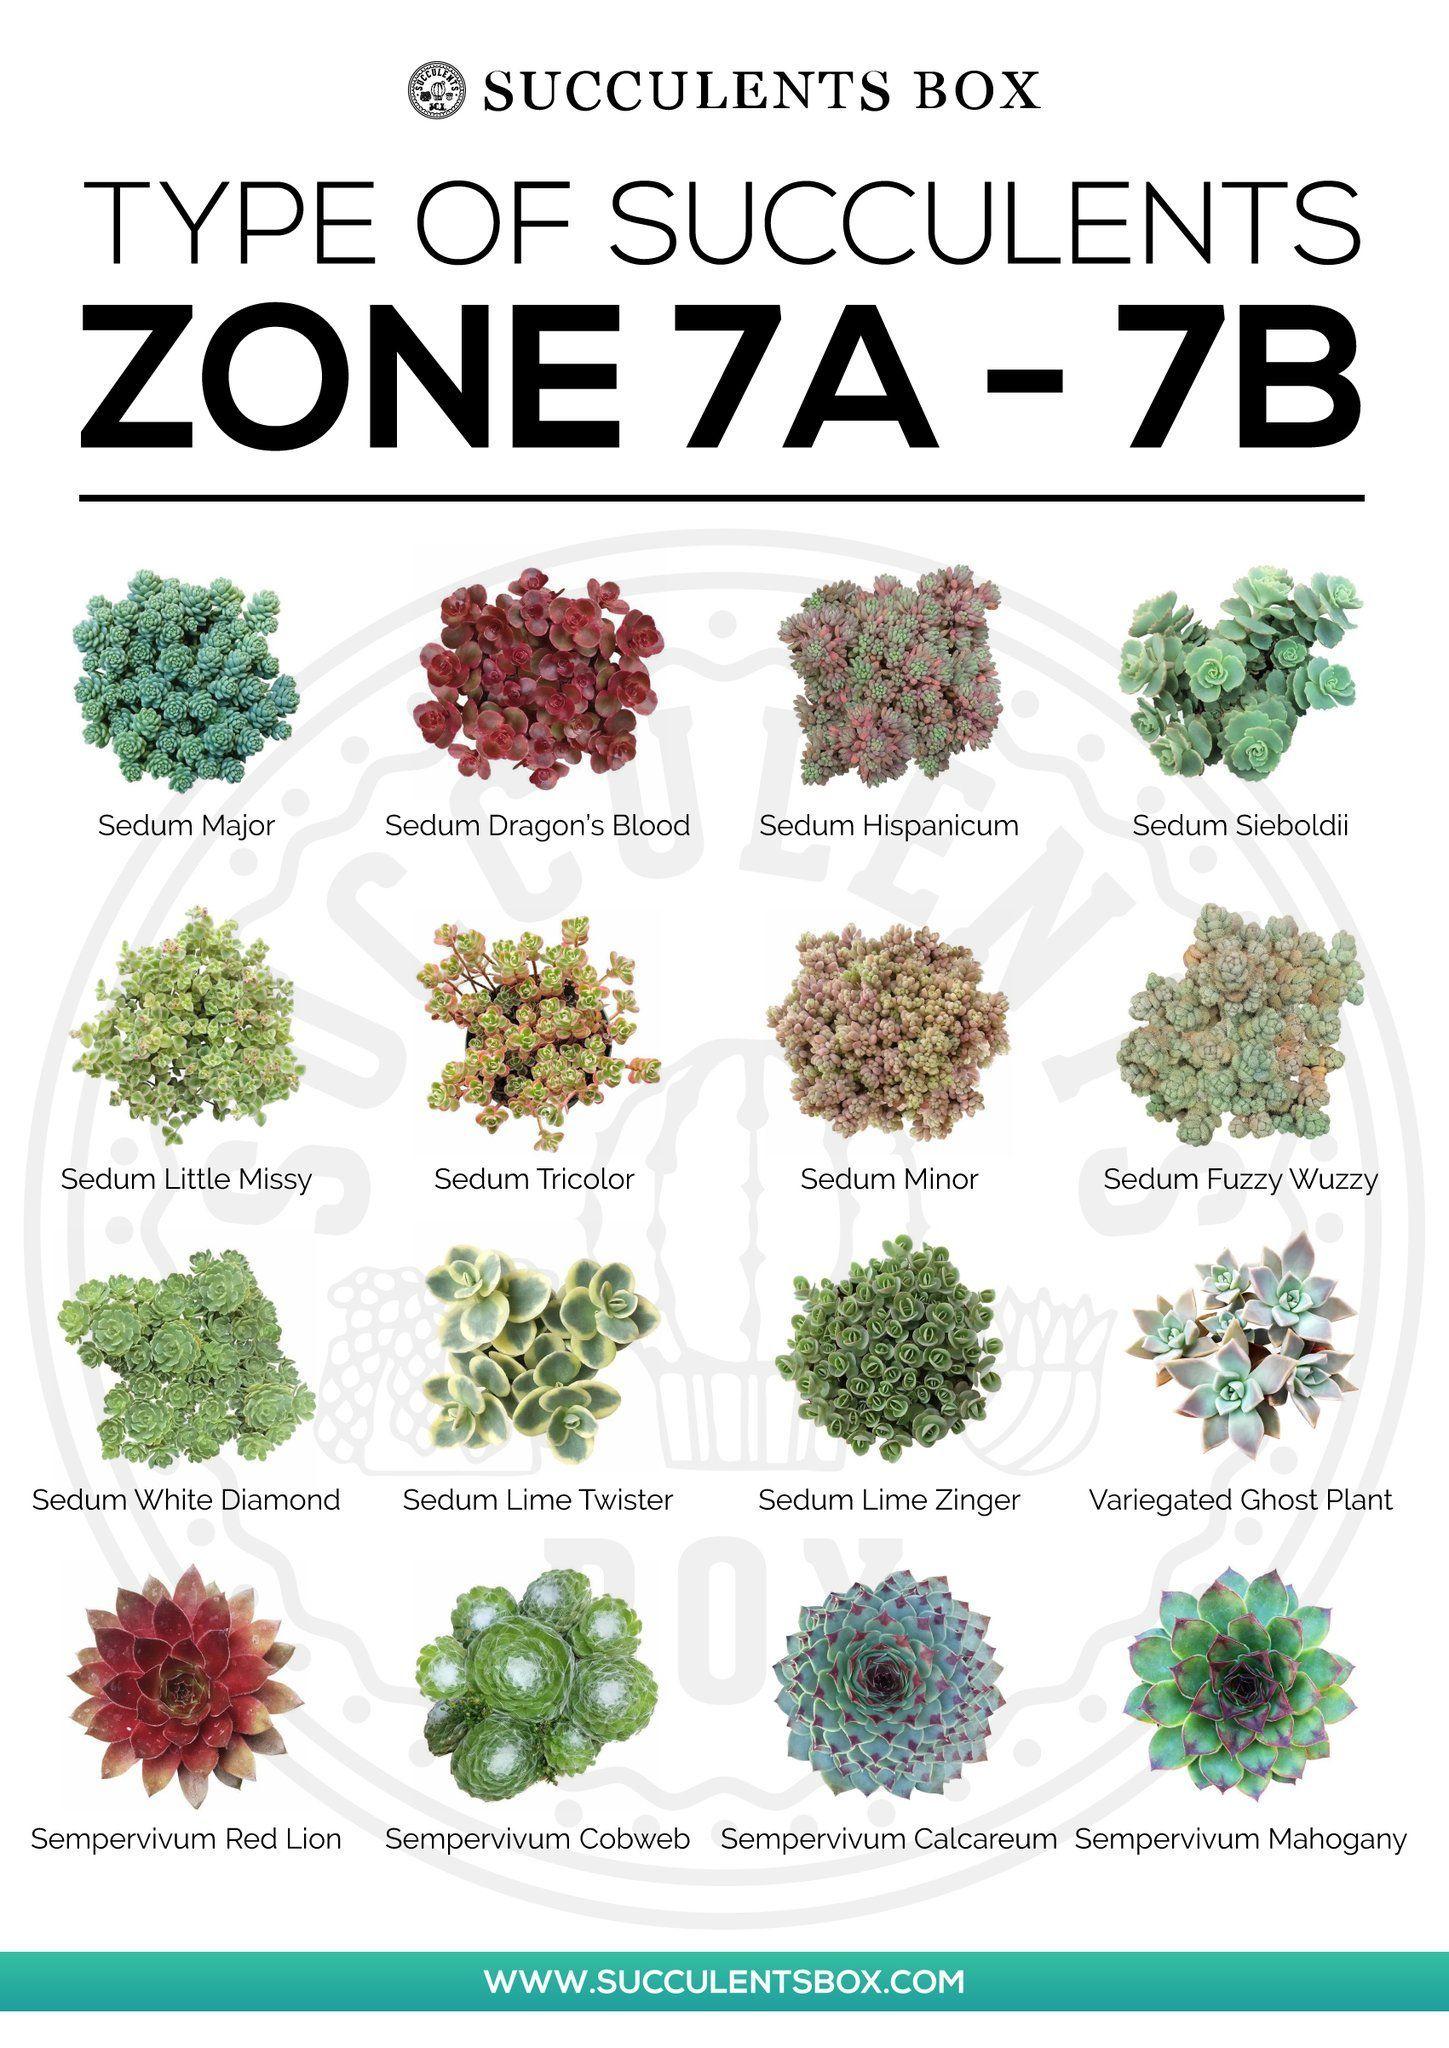 799a27dbe957e479b3d5e05b770cc814 - What Zone Is Georgia For Gardening